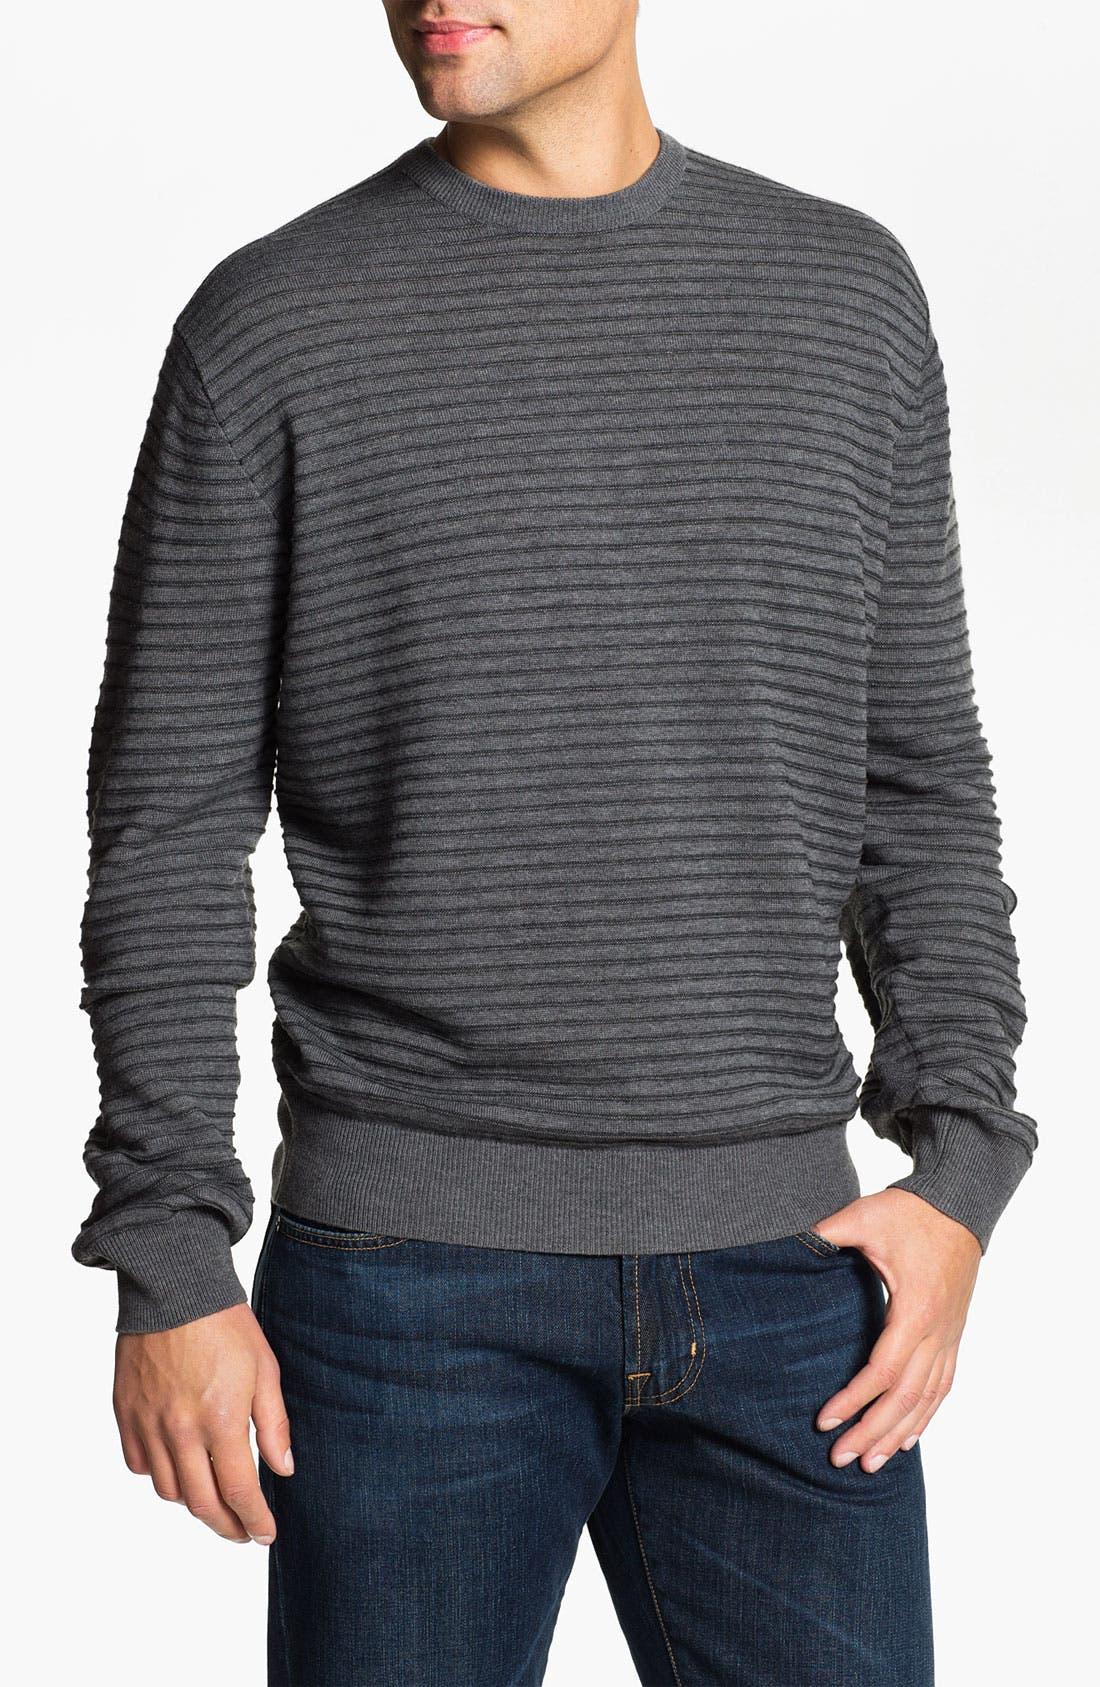 Alternate Image 1 Selected - Toscano Merino Wool Blend Crewneck Sweater